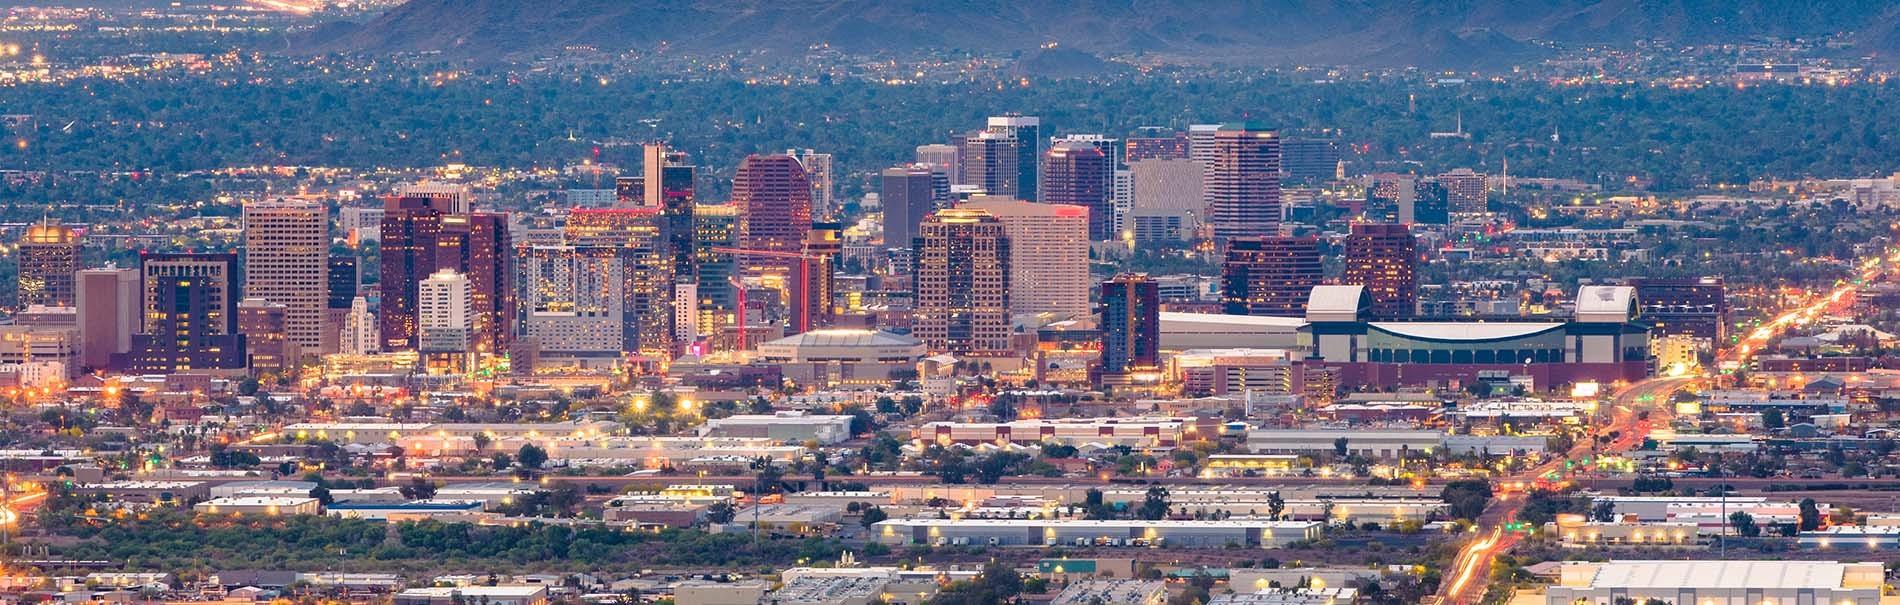 MissionHeightsPreparatorySchool-Highschool-Arizona-PhoenixSkyline-Banner